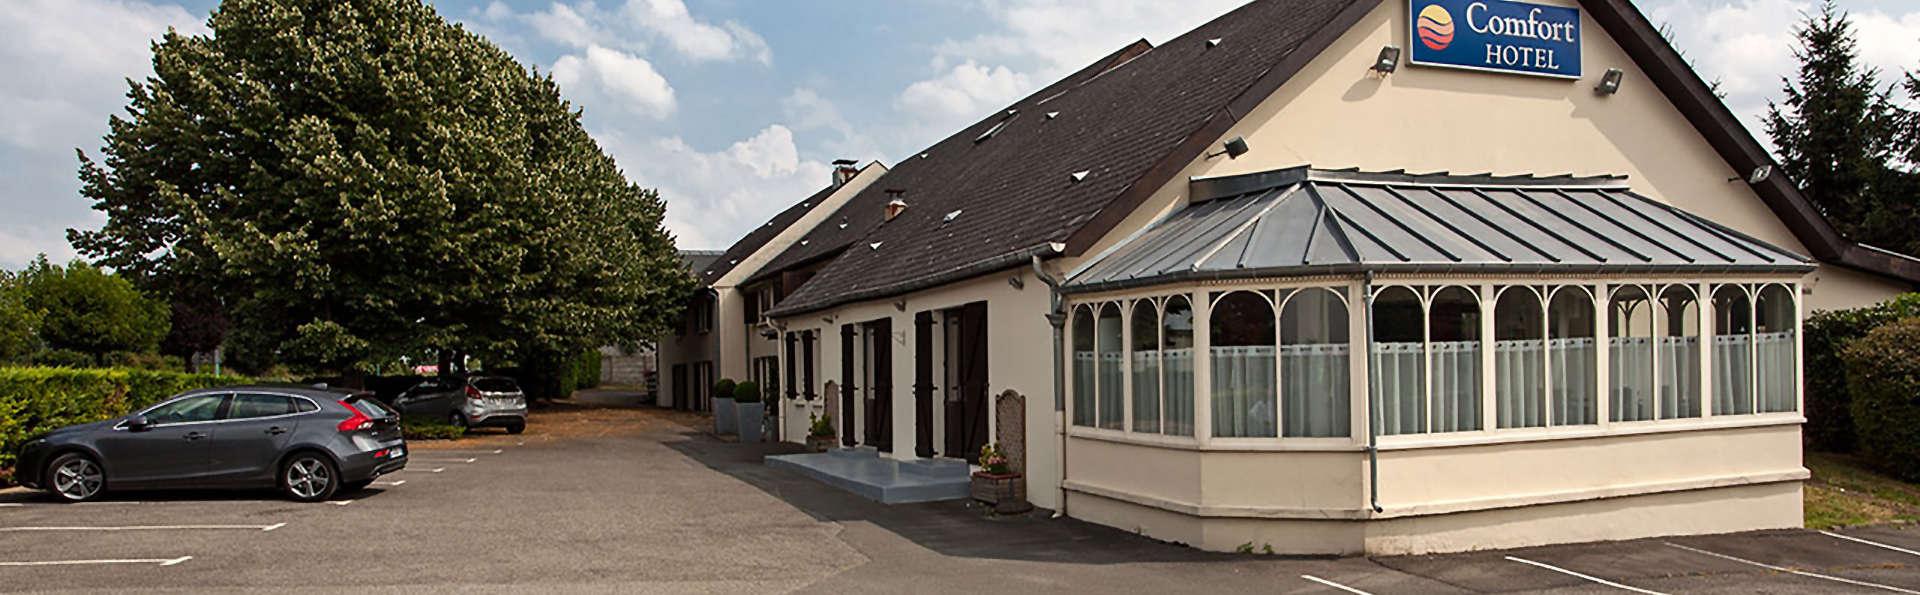 Comfort Hôtel Orly Morangis - Edit_Front.jpg